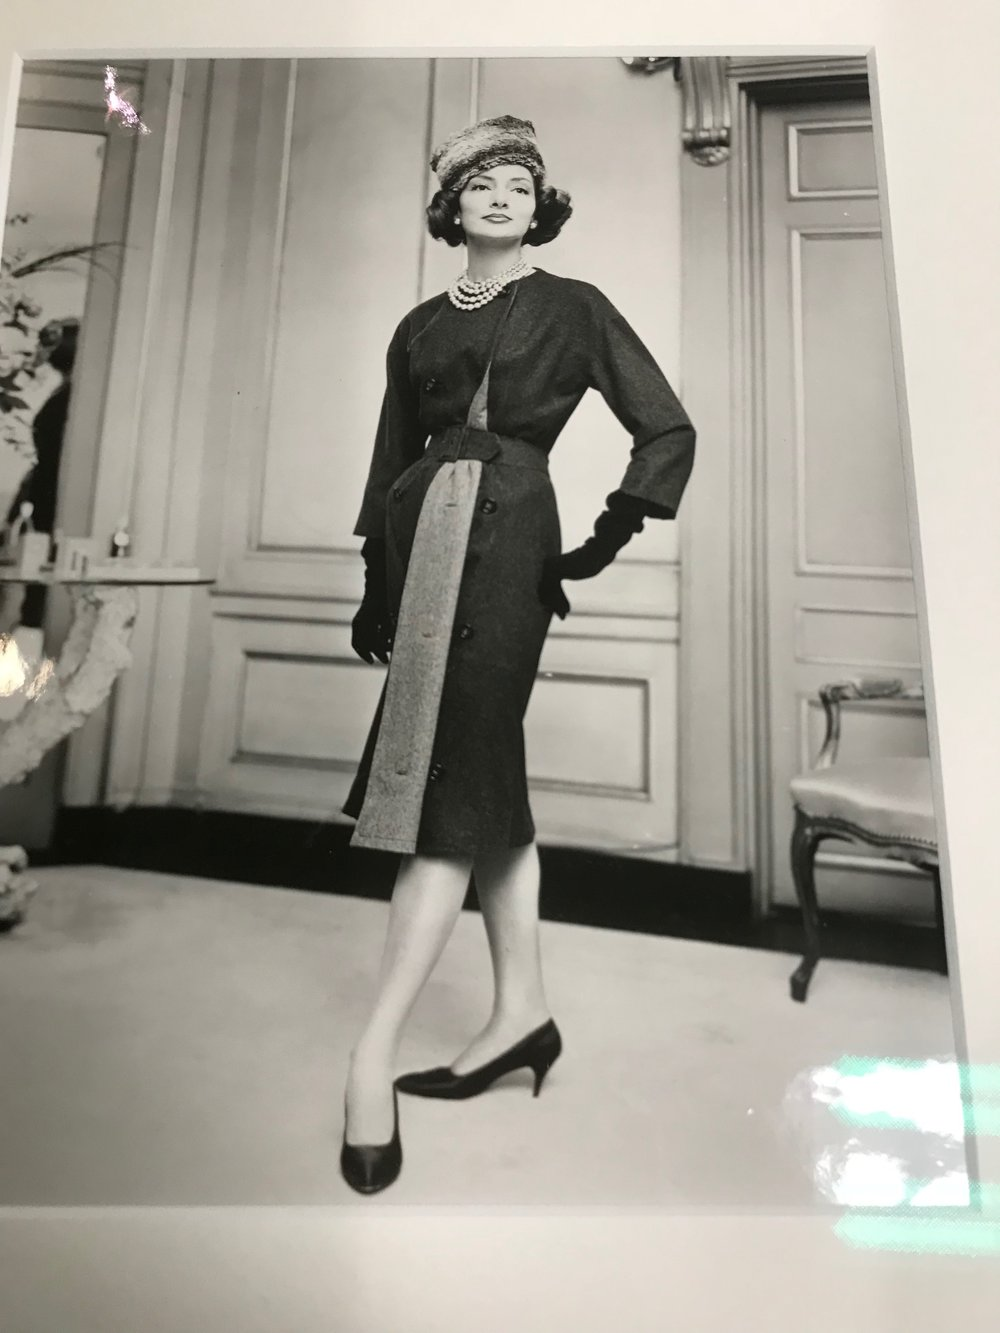 Trish Lonergan's aunt, Adele, a model whose designer clothing was the original inspiration for Esther's.